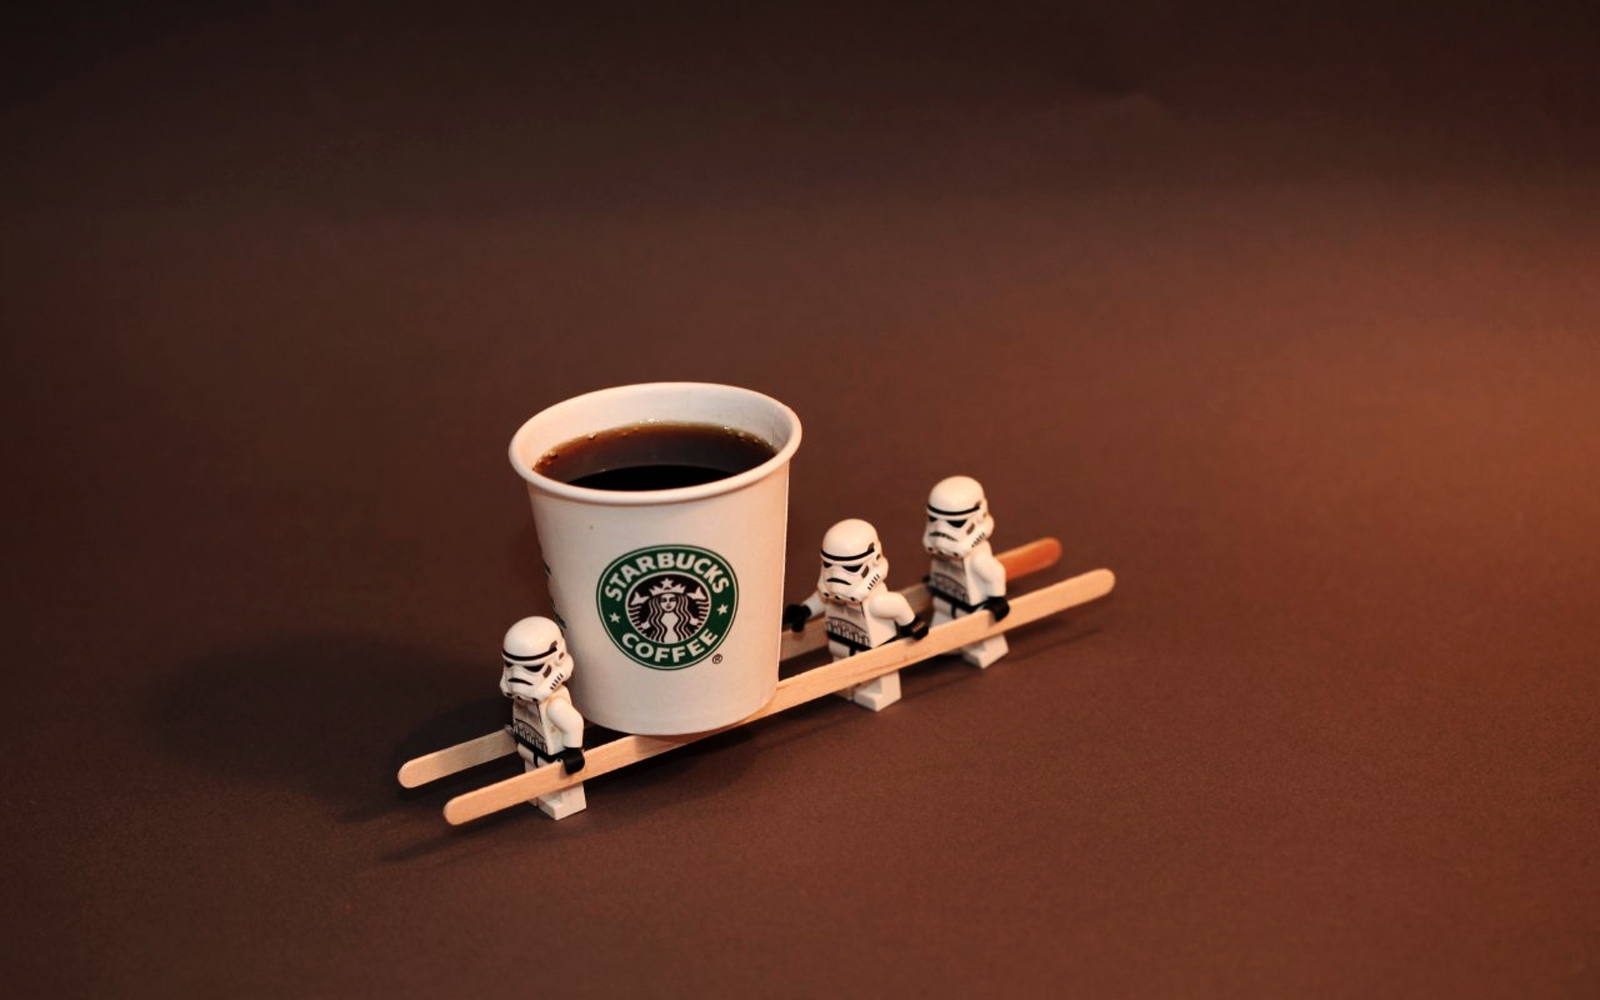 Starbucks Coffee Logo HD Wallpapers | Desktop Wallpapers